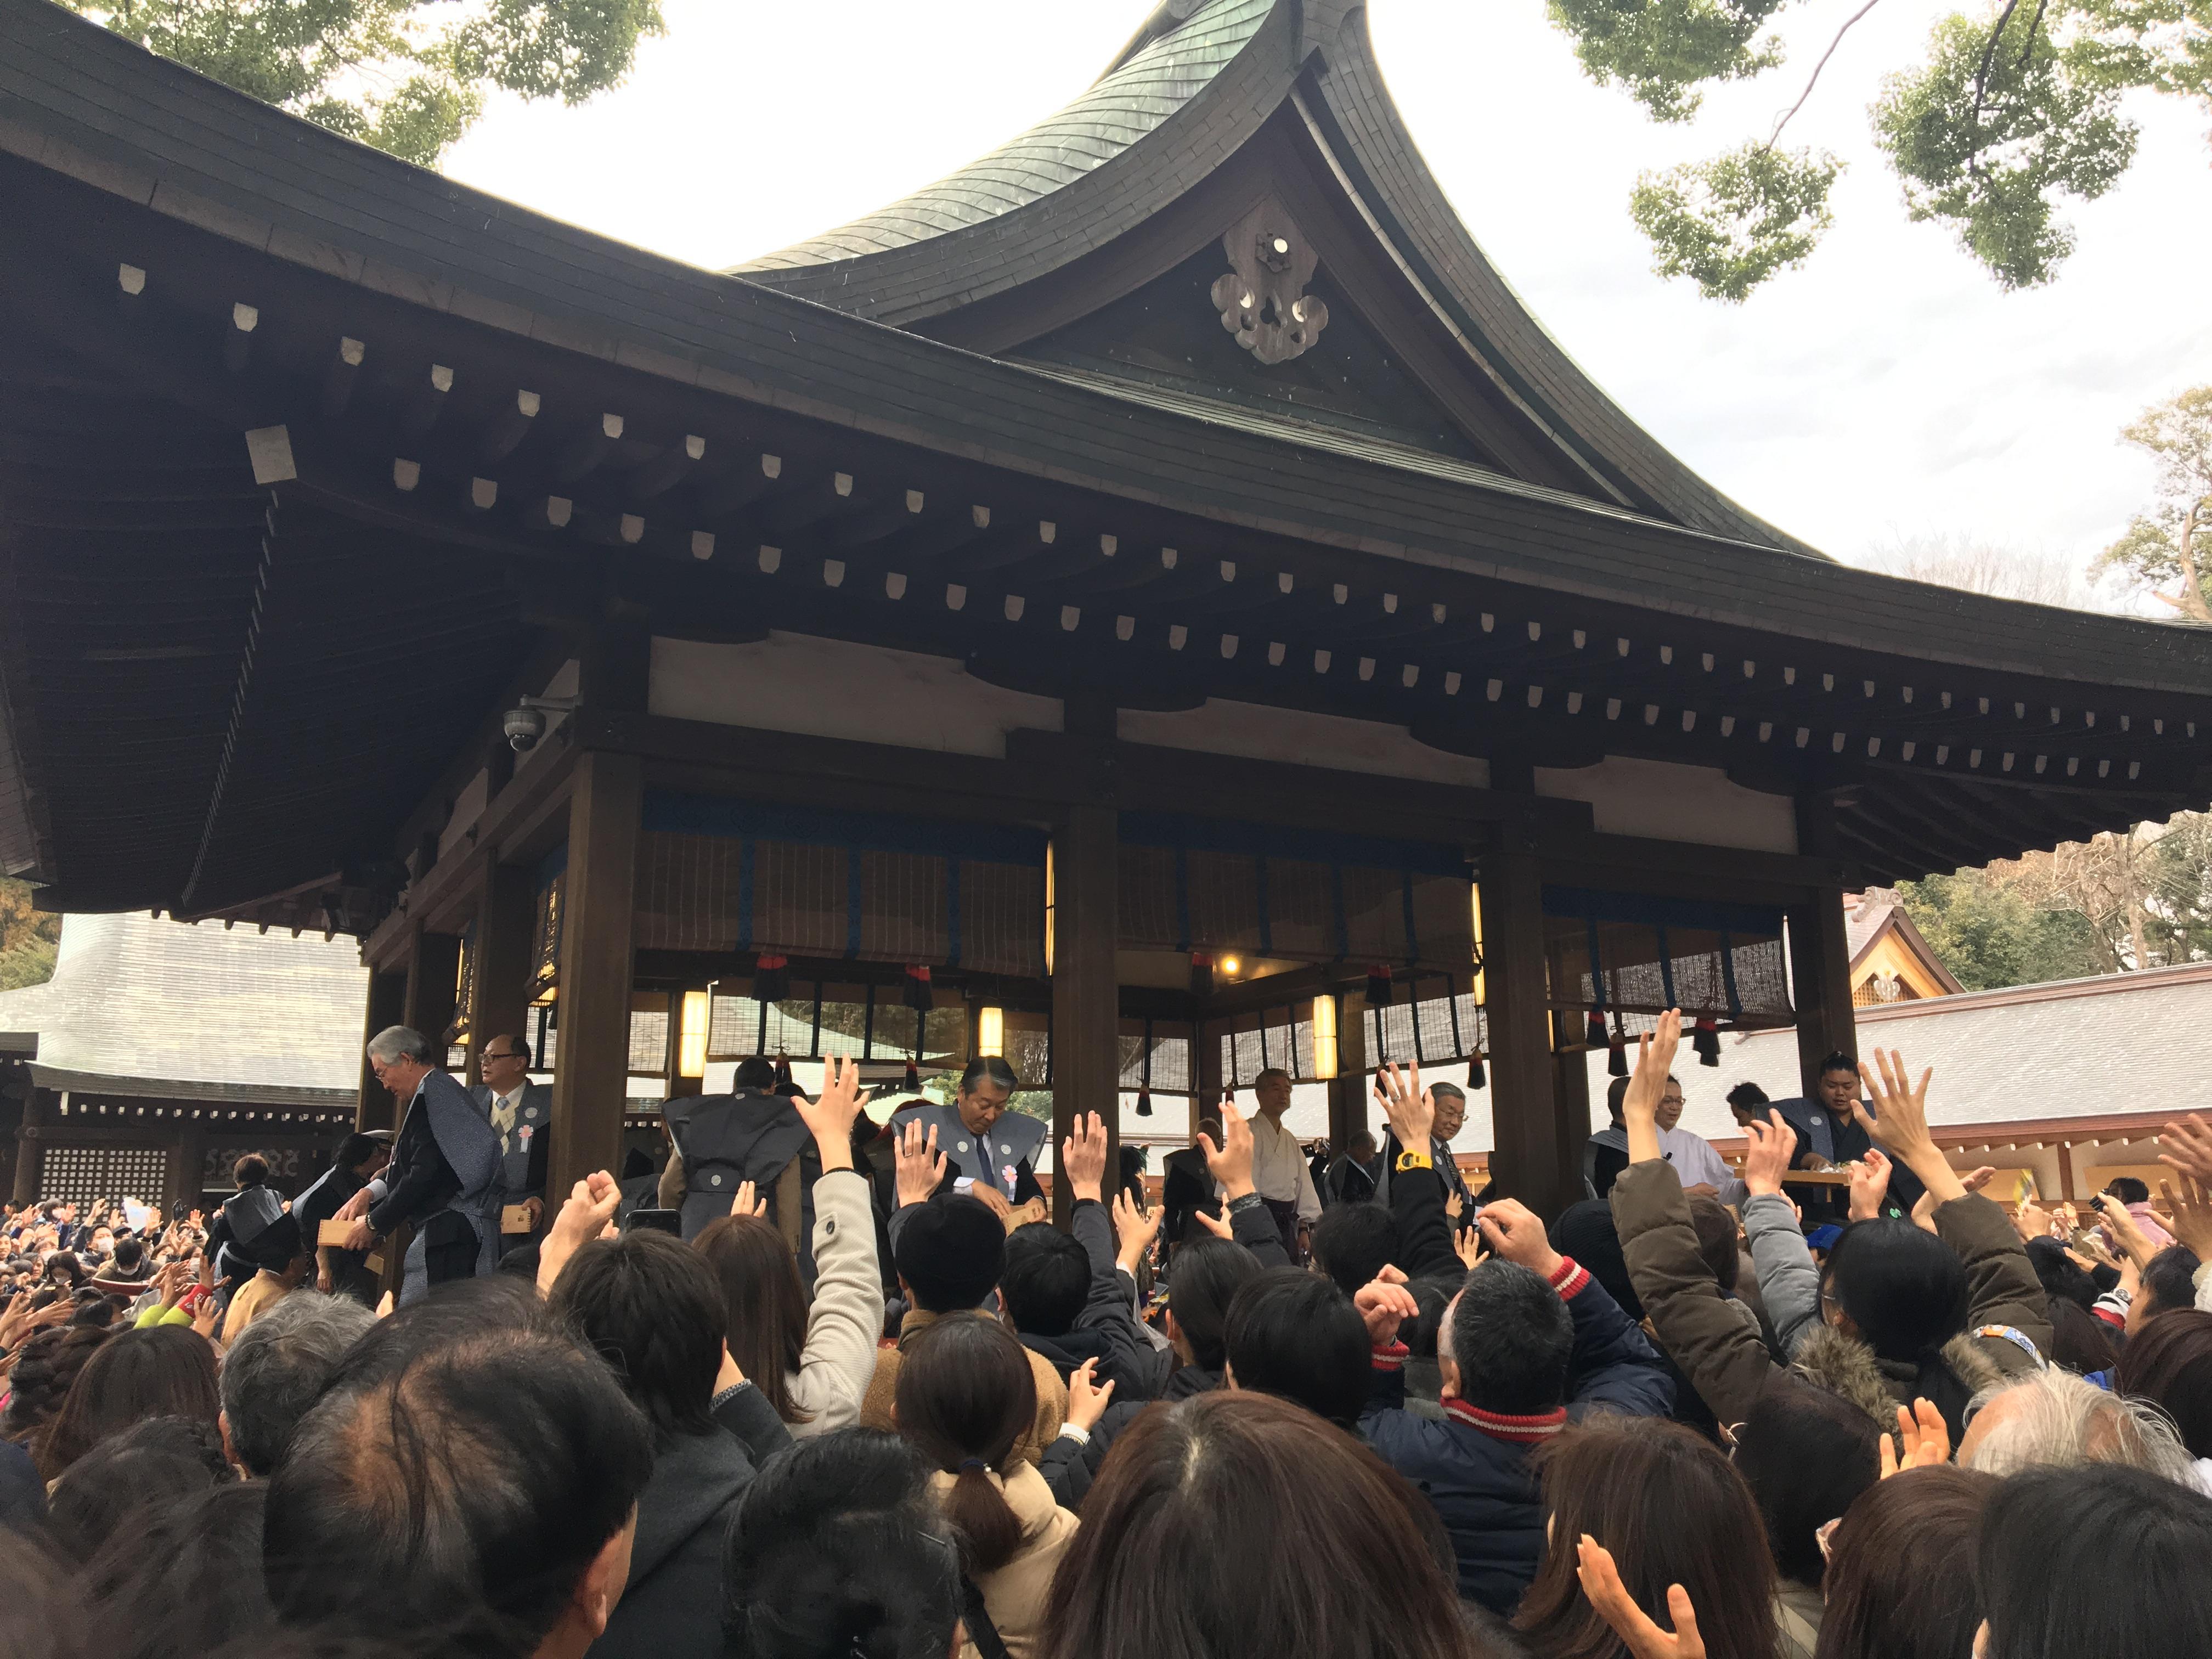 邪鬼を祓い無病息災 2019年武蔵一宮氷川神社節分祭開催